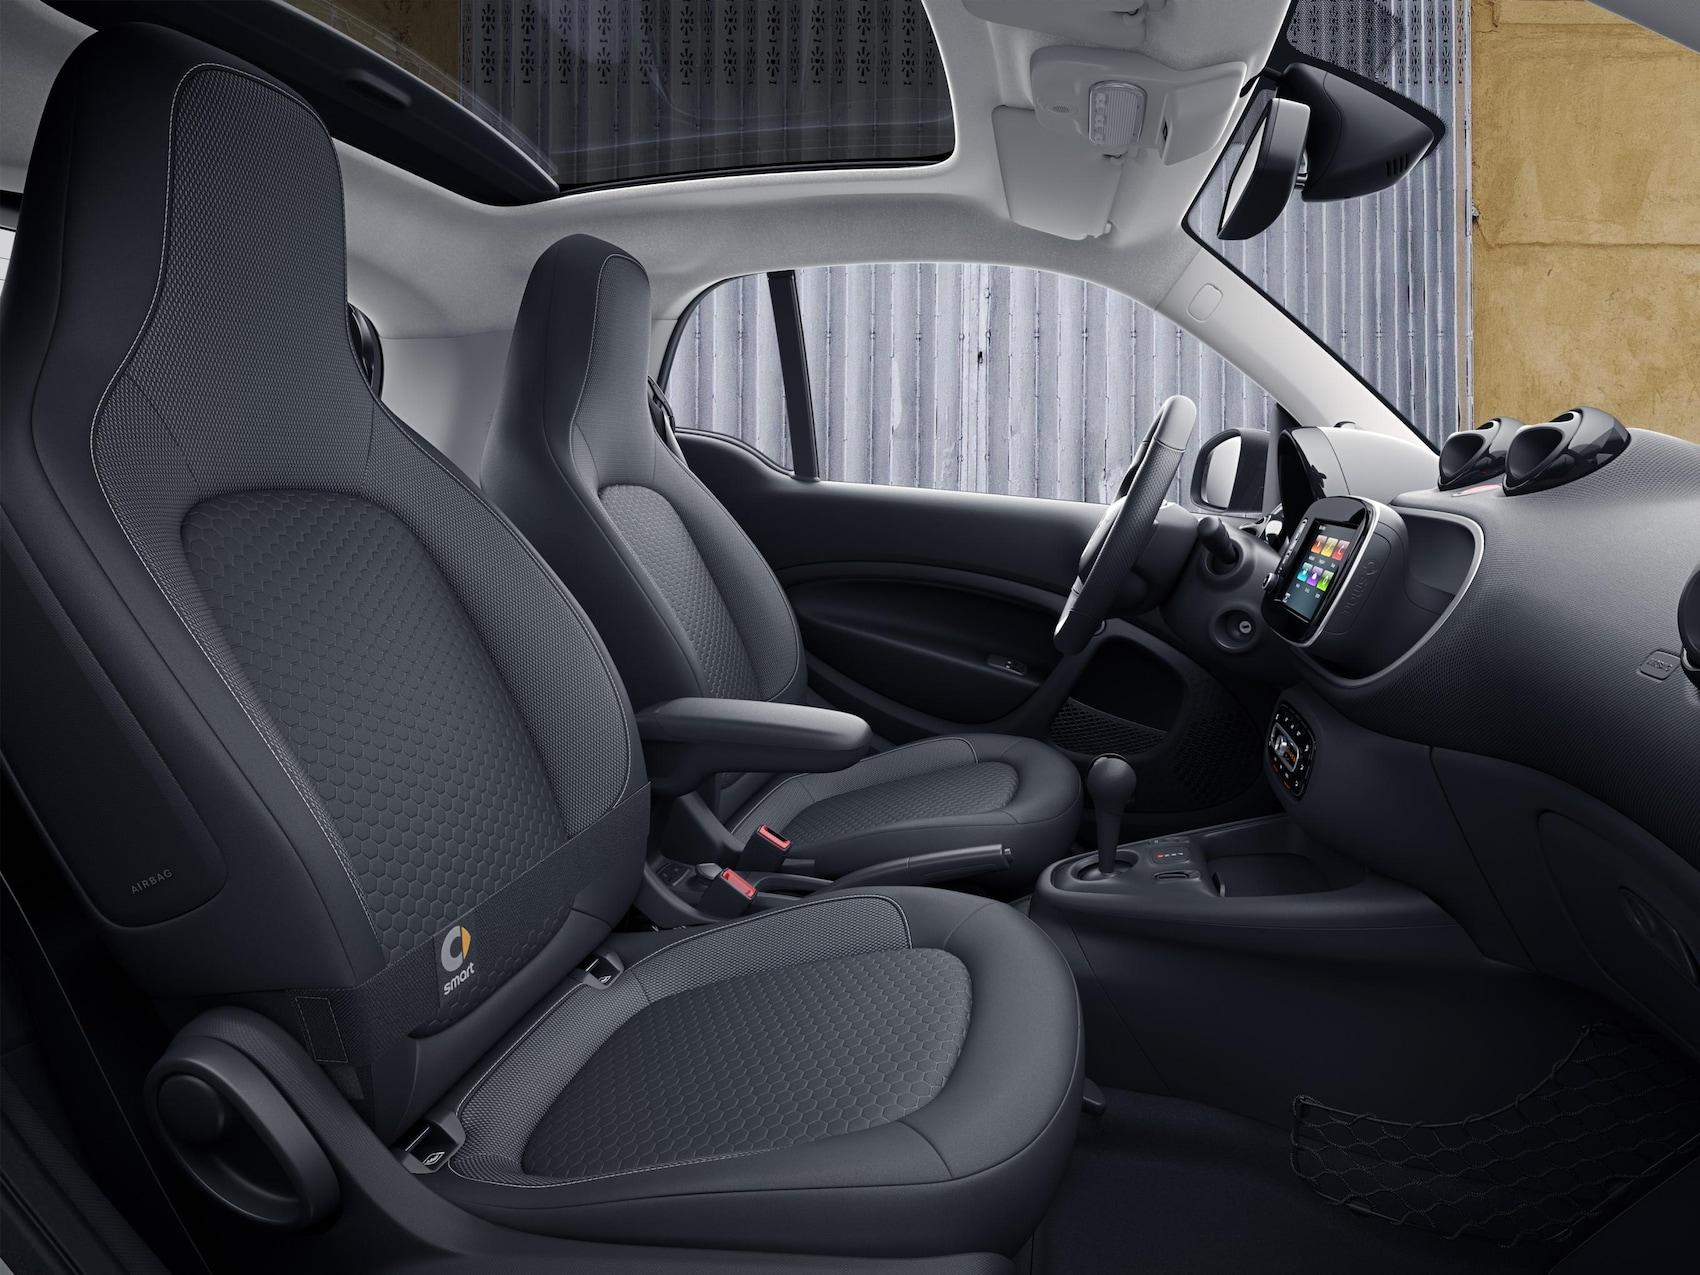 Das neue Sitzdesign des smart EQ fortwo.